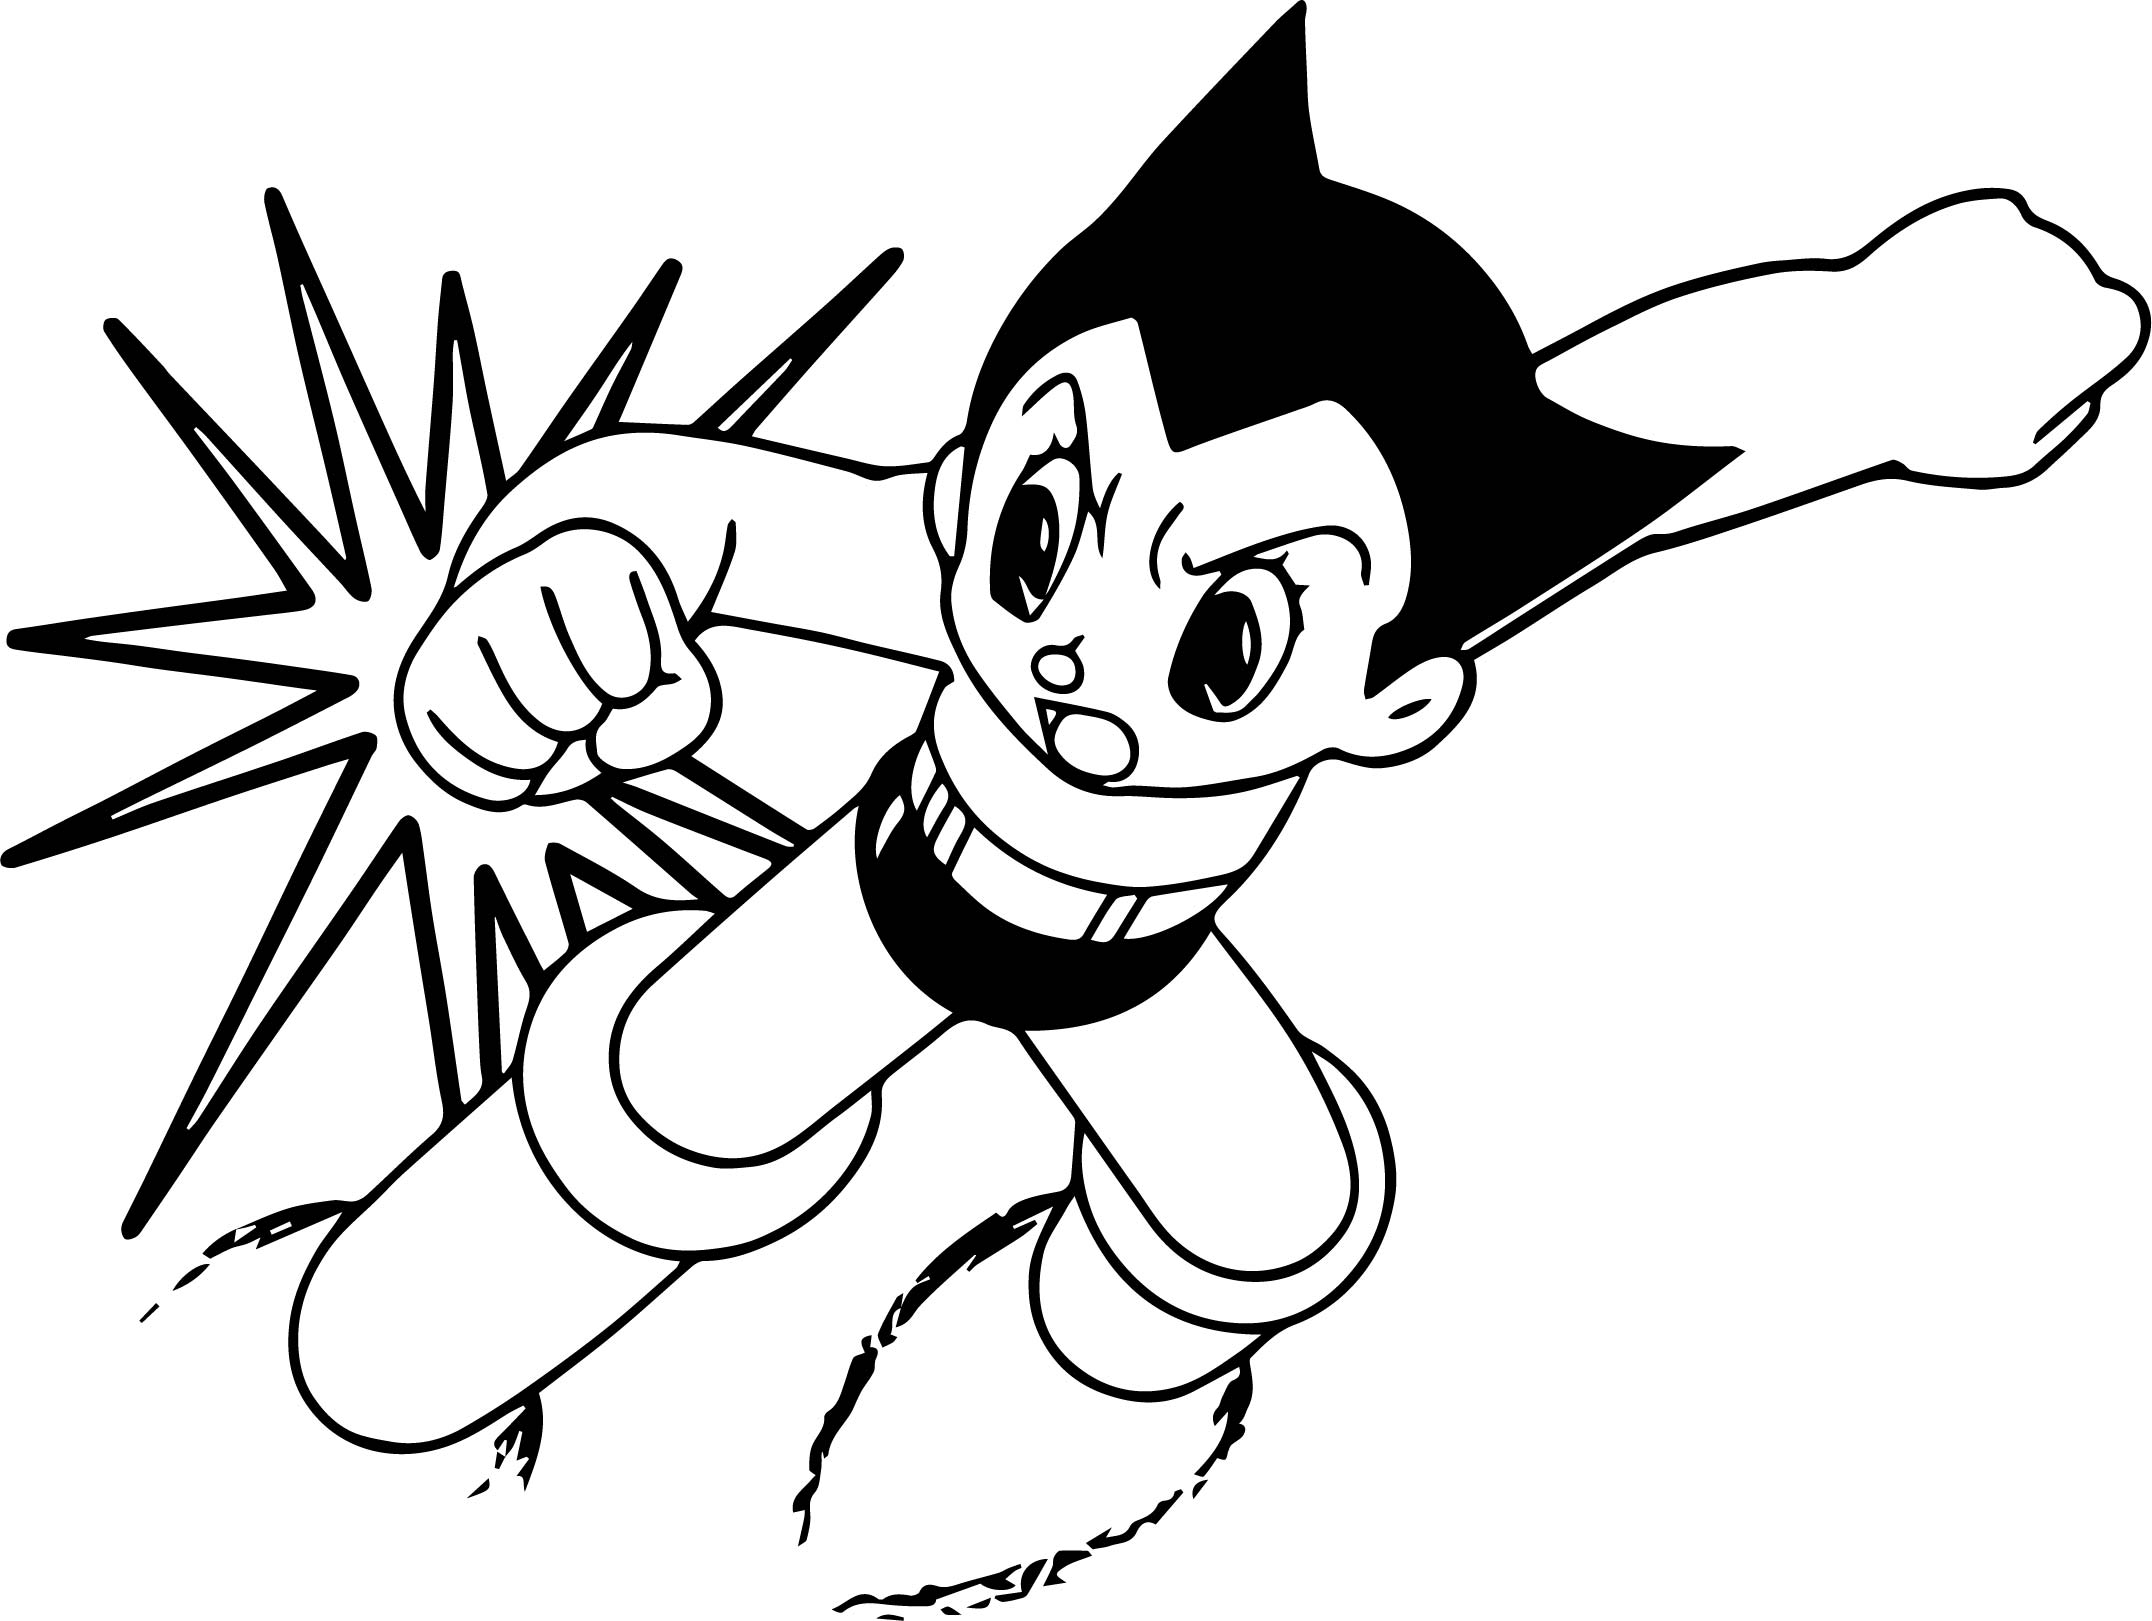 astro boy coloring pages free - fighting astro boy printable cartoon coloring page